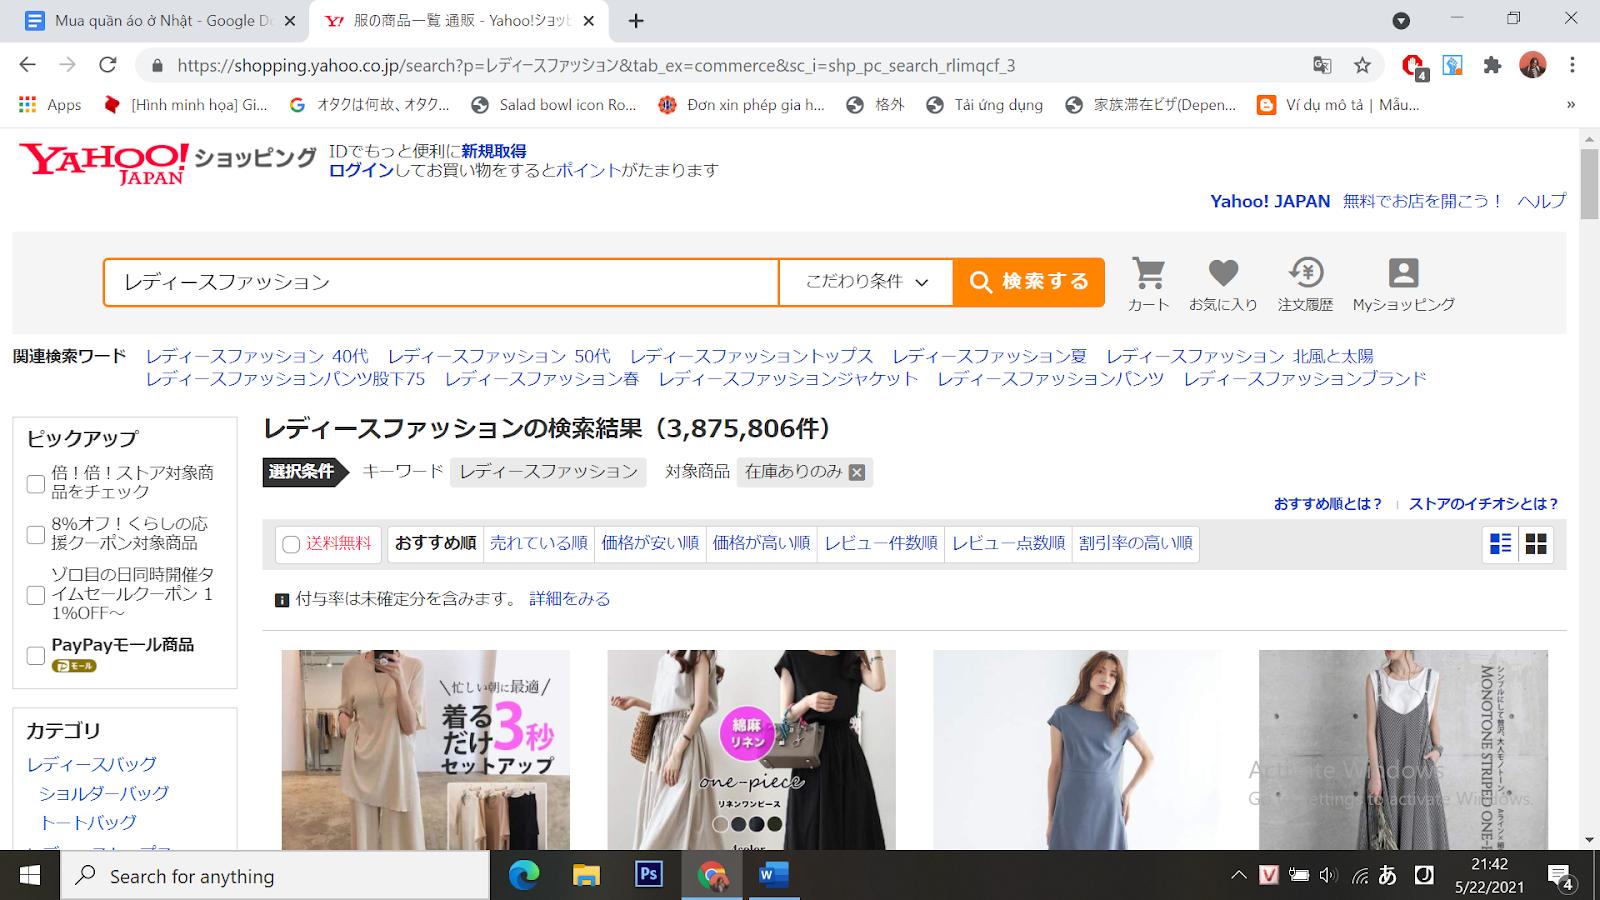 web Yahoo! Shopping